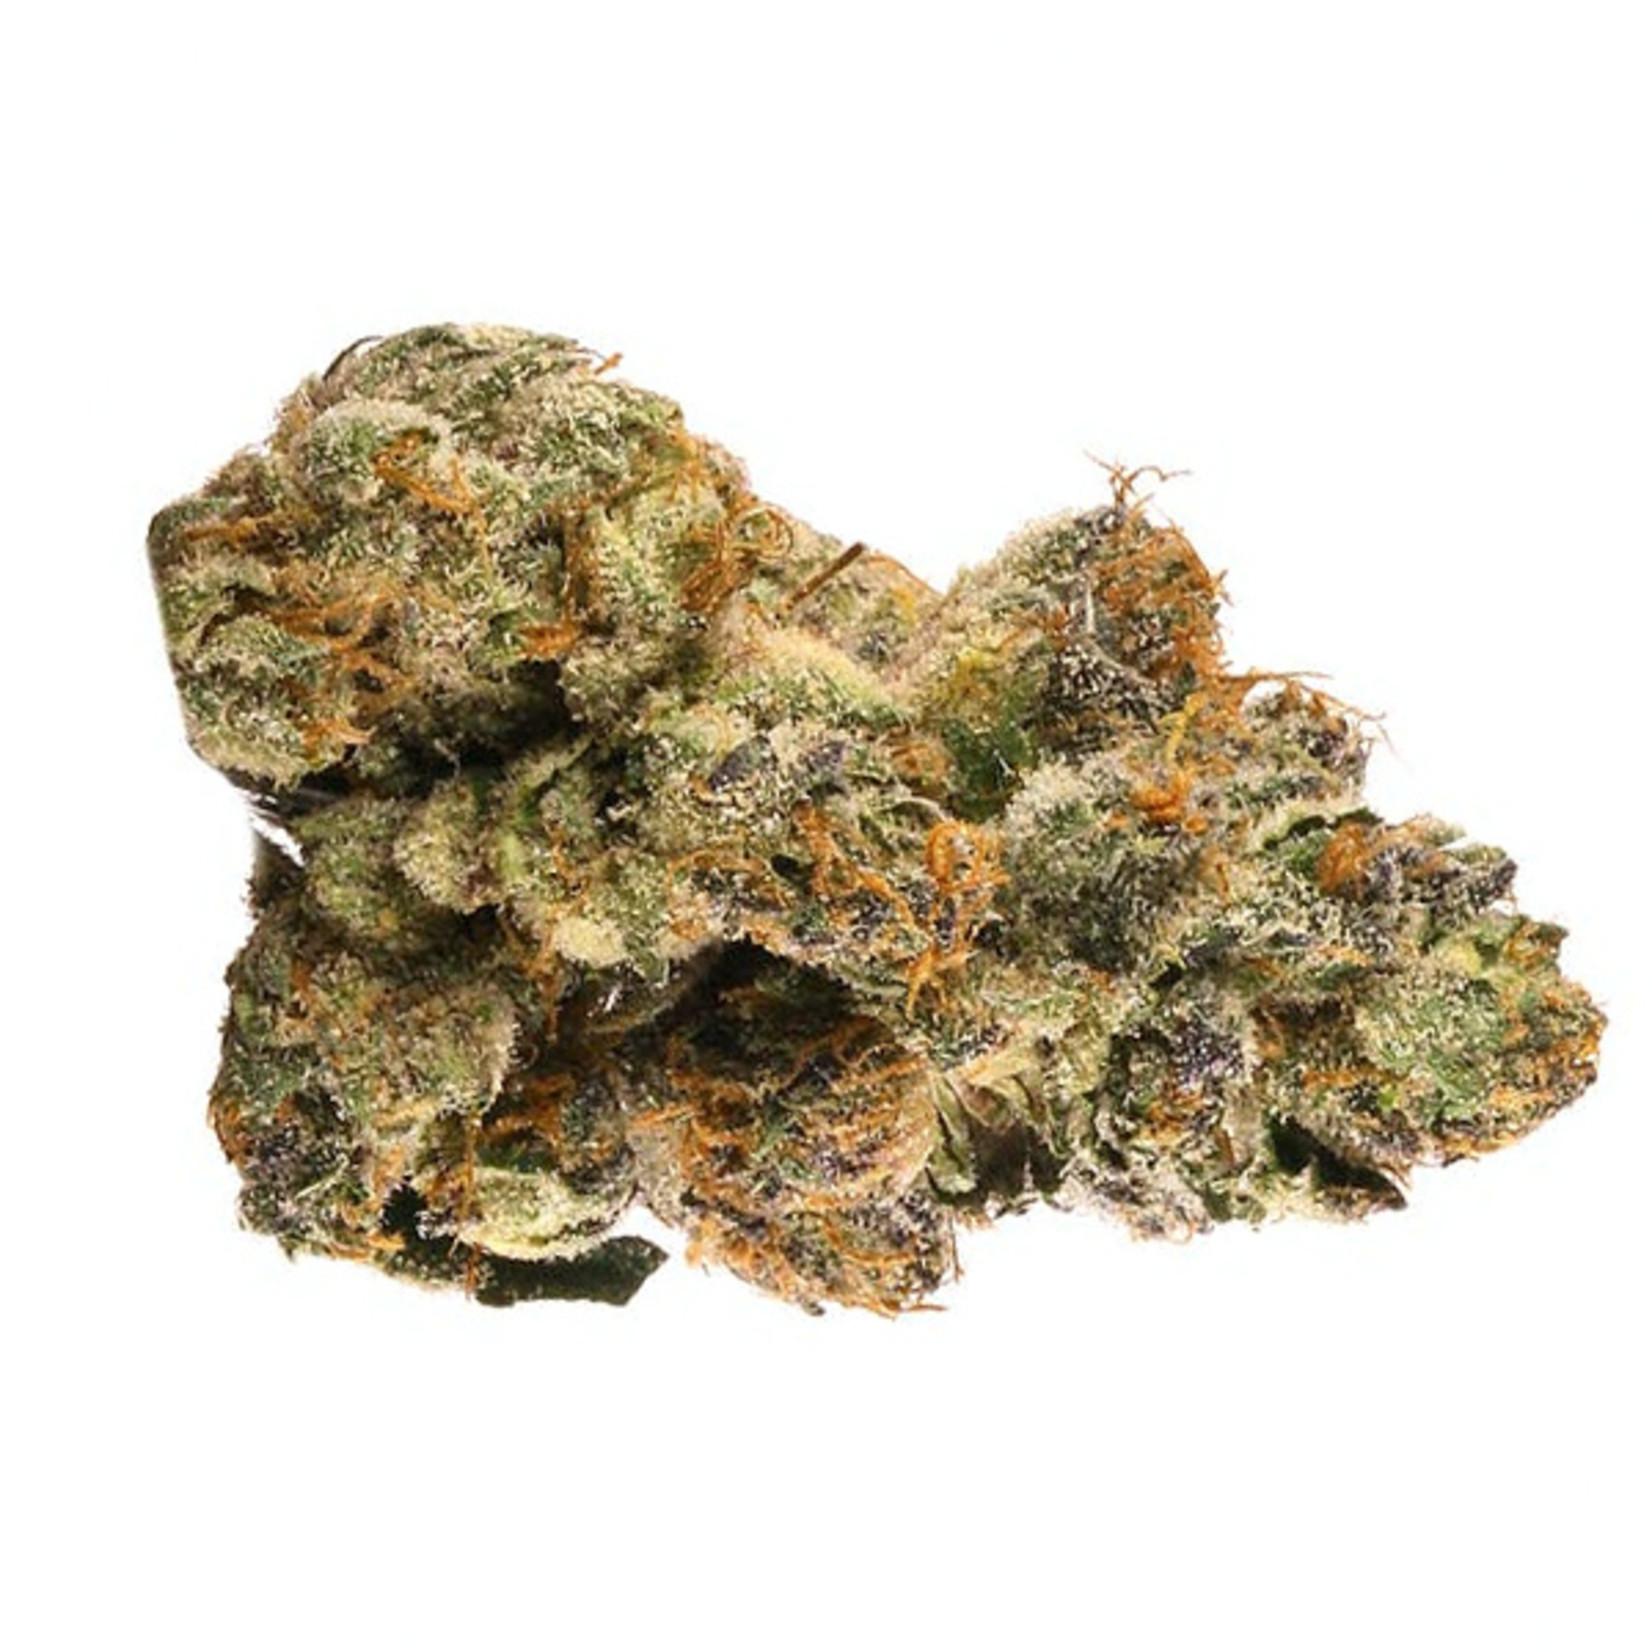 Auto Gelato #33 cannabis seeds